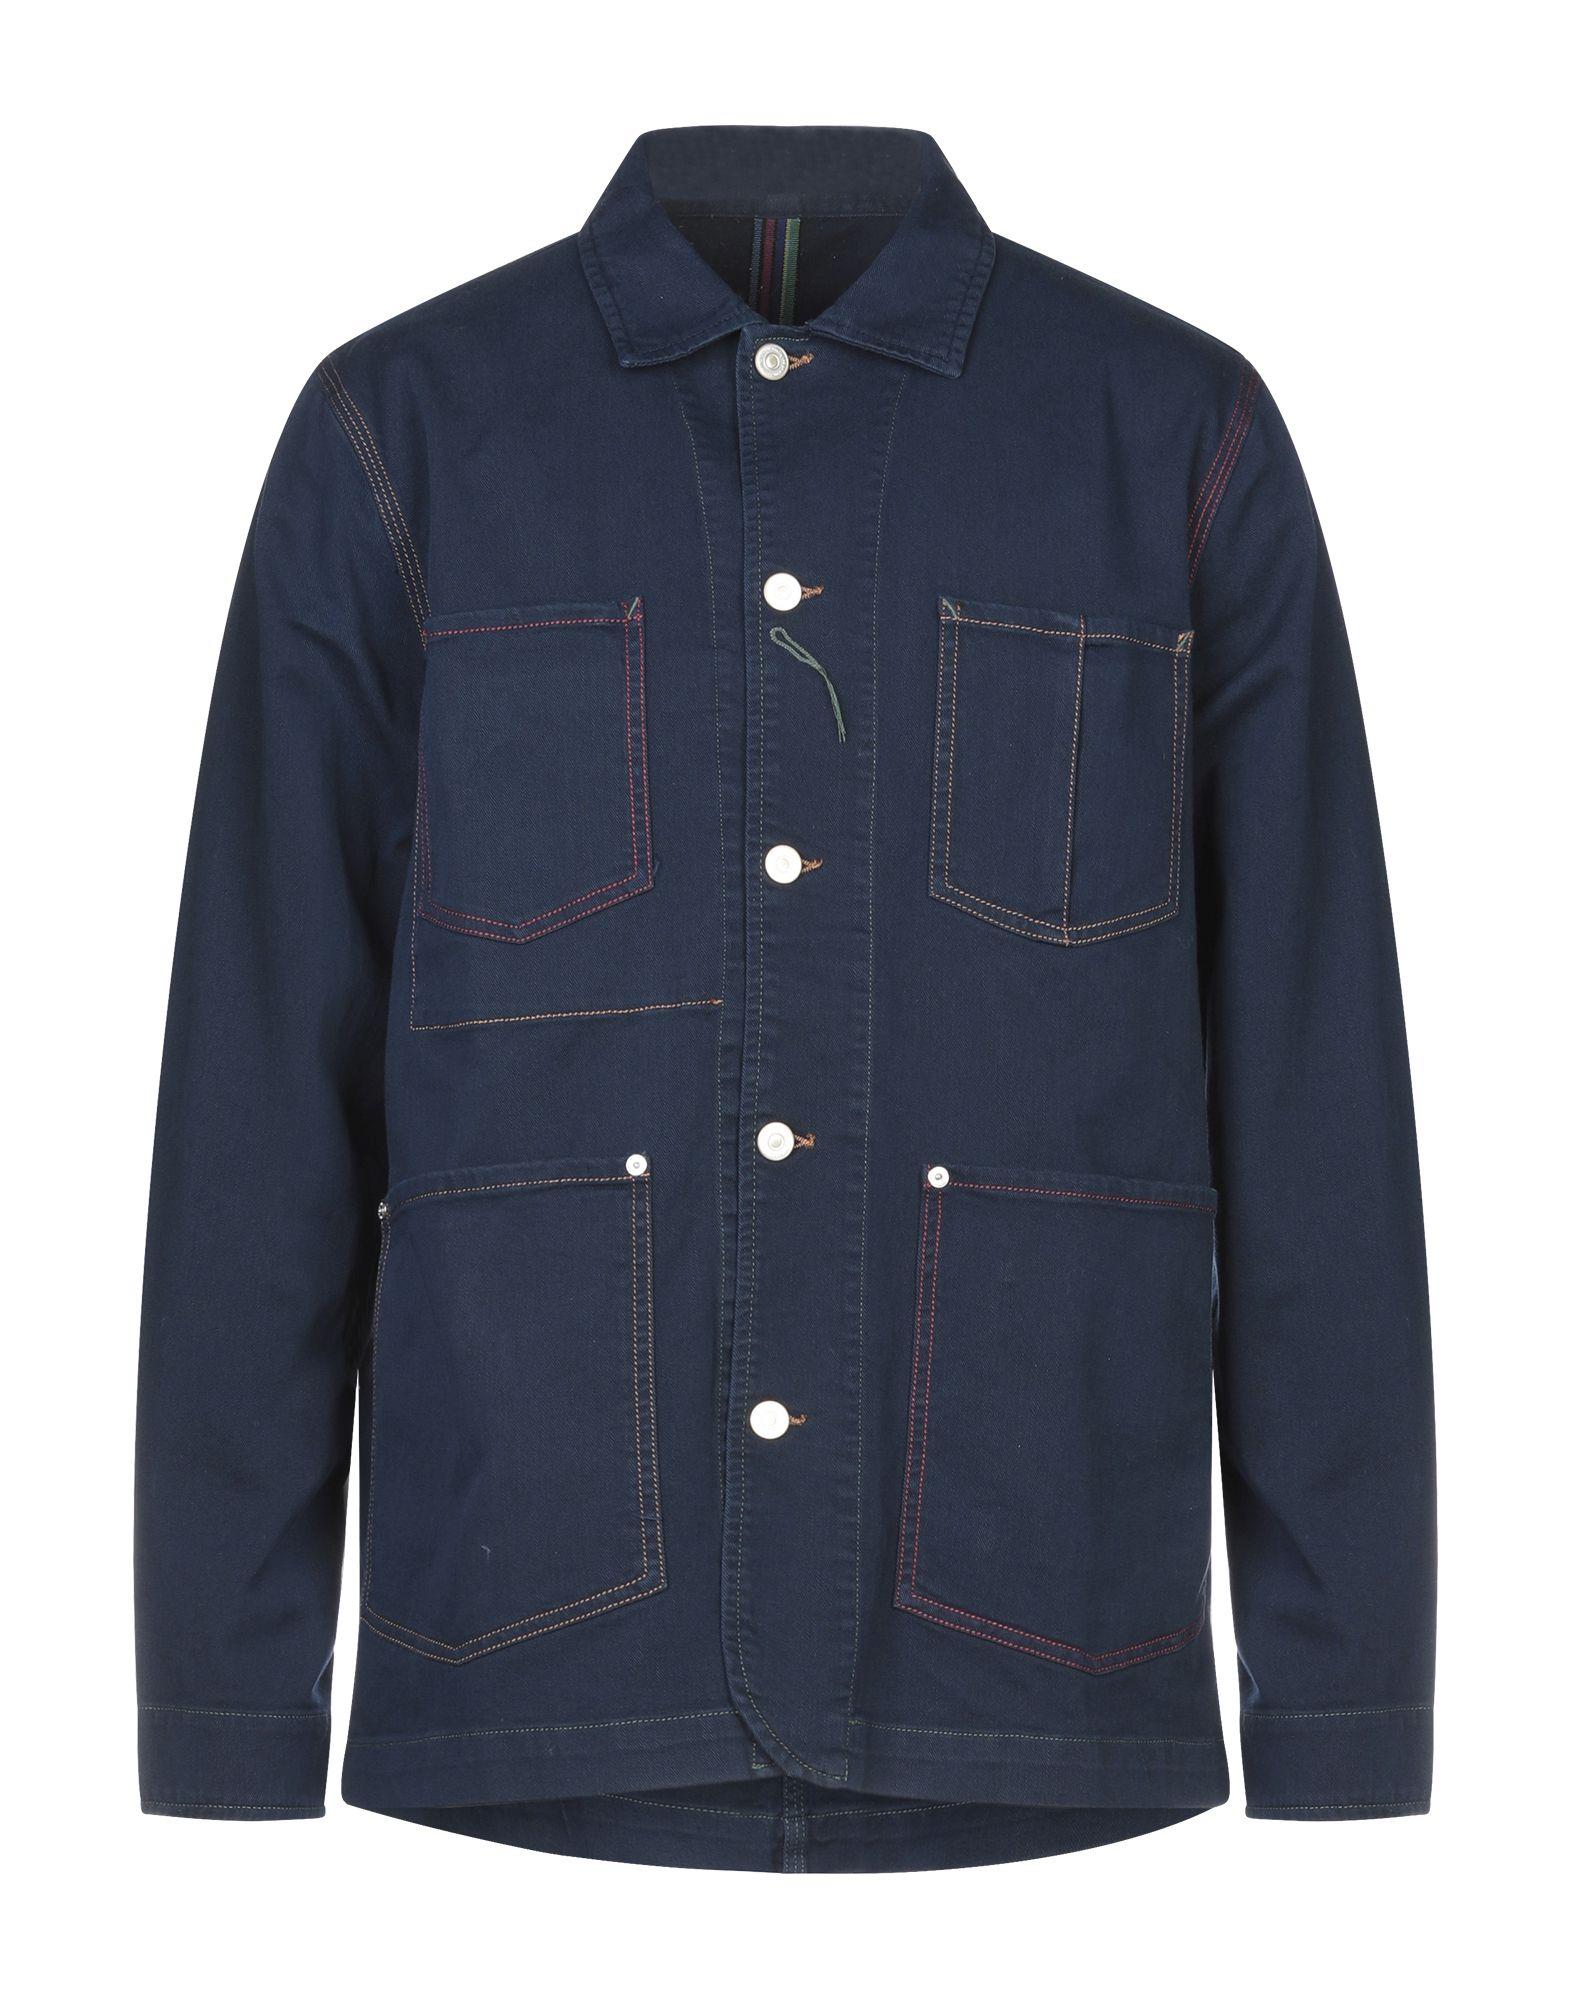 PS PAUL SMITH Denim outerwear - Item 42796260